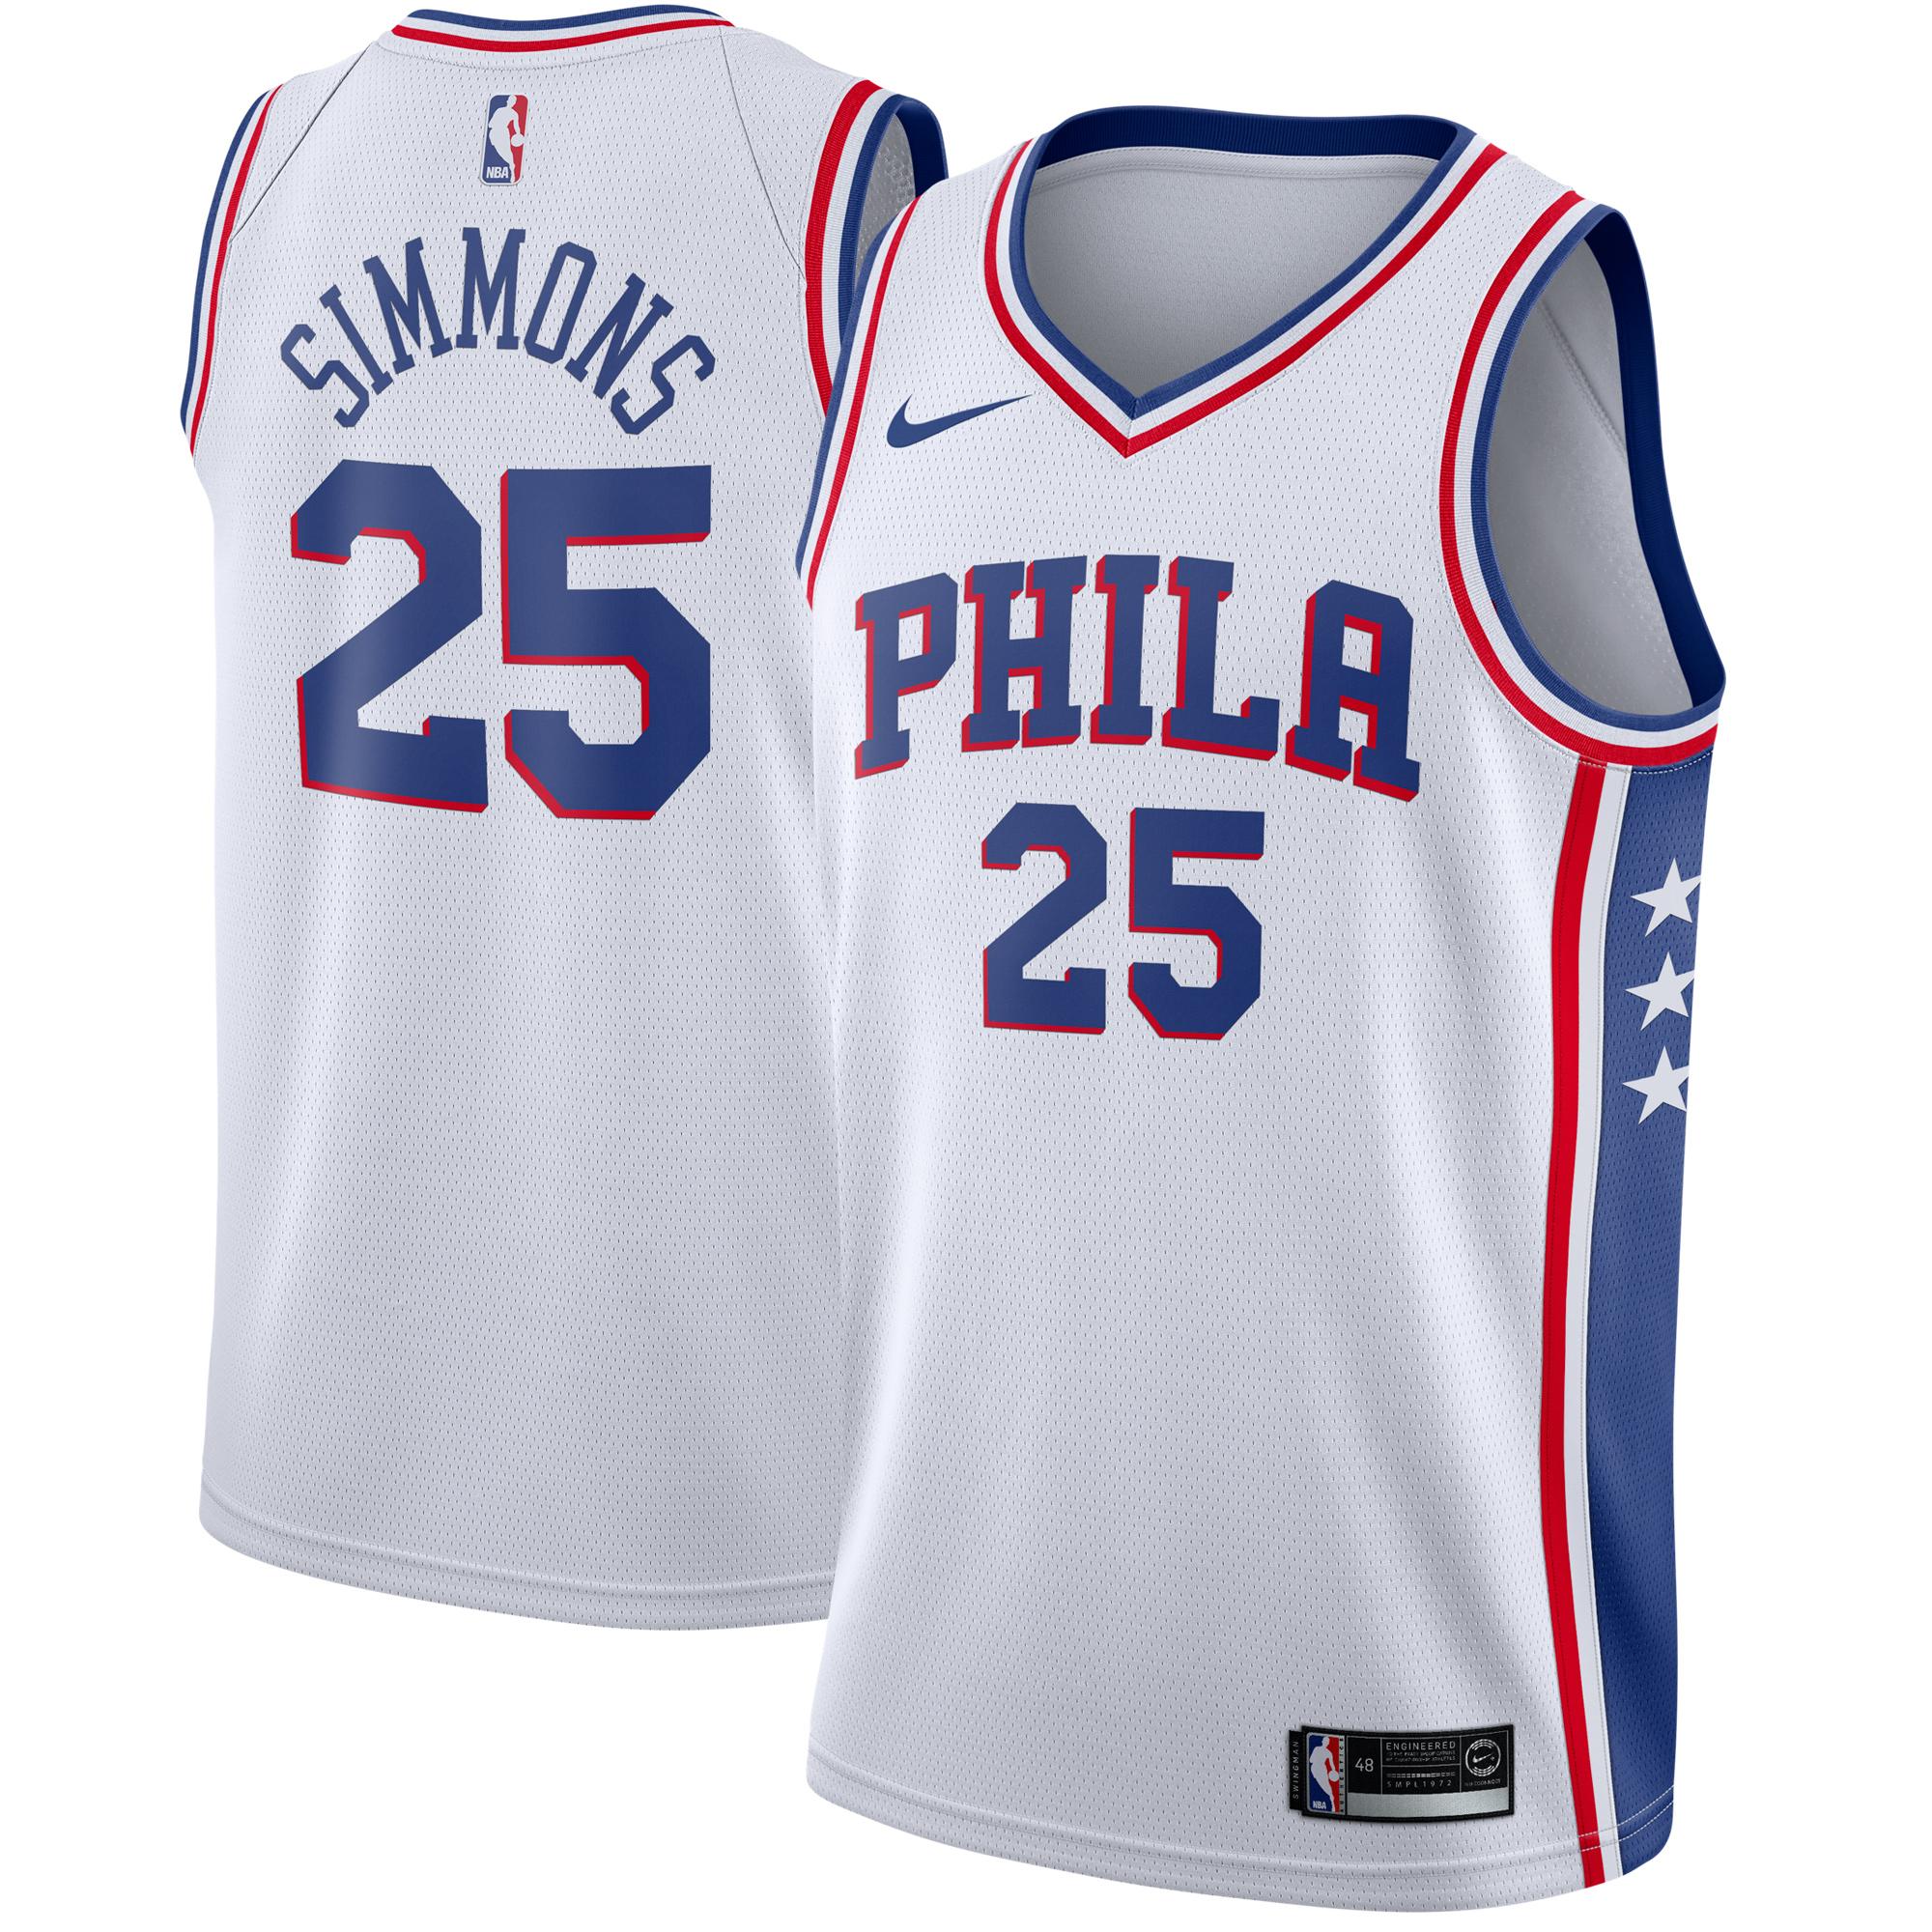 Ben Simmons Philadelphia 76ers Nike Swingman Jersey White - Association Edition